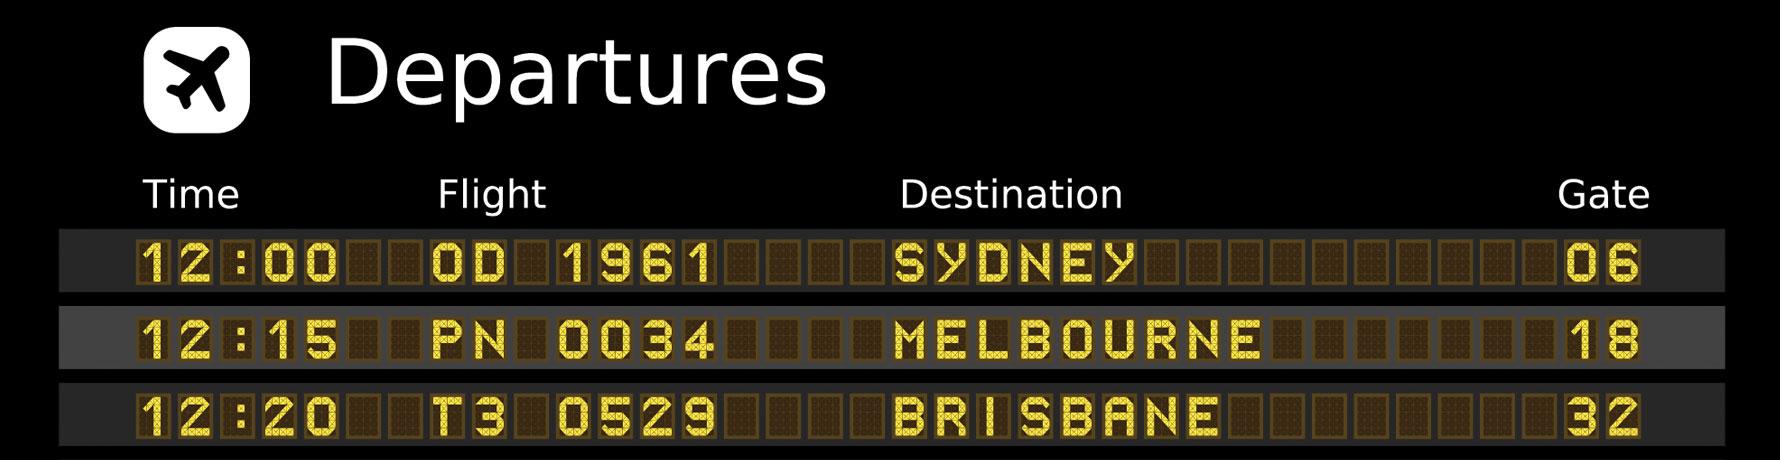 Aeropuertos en Australia